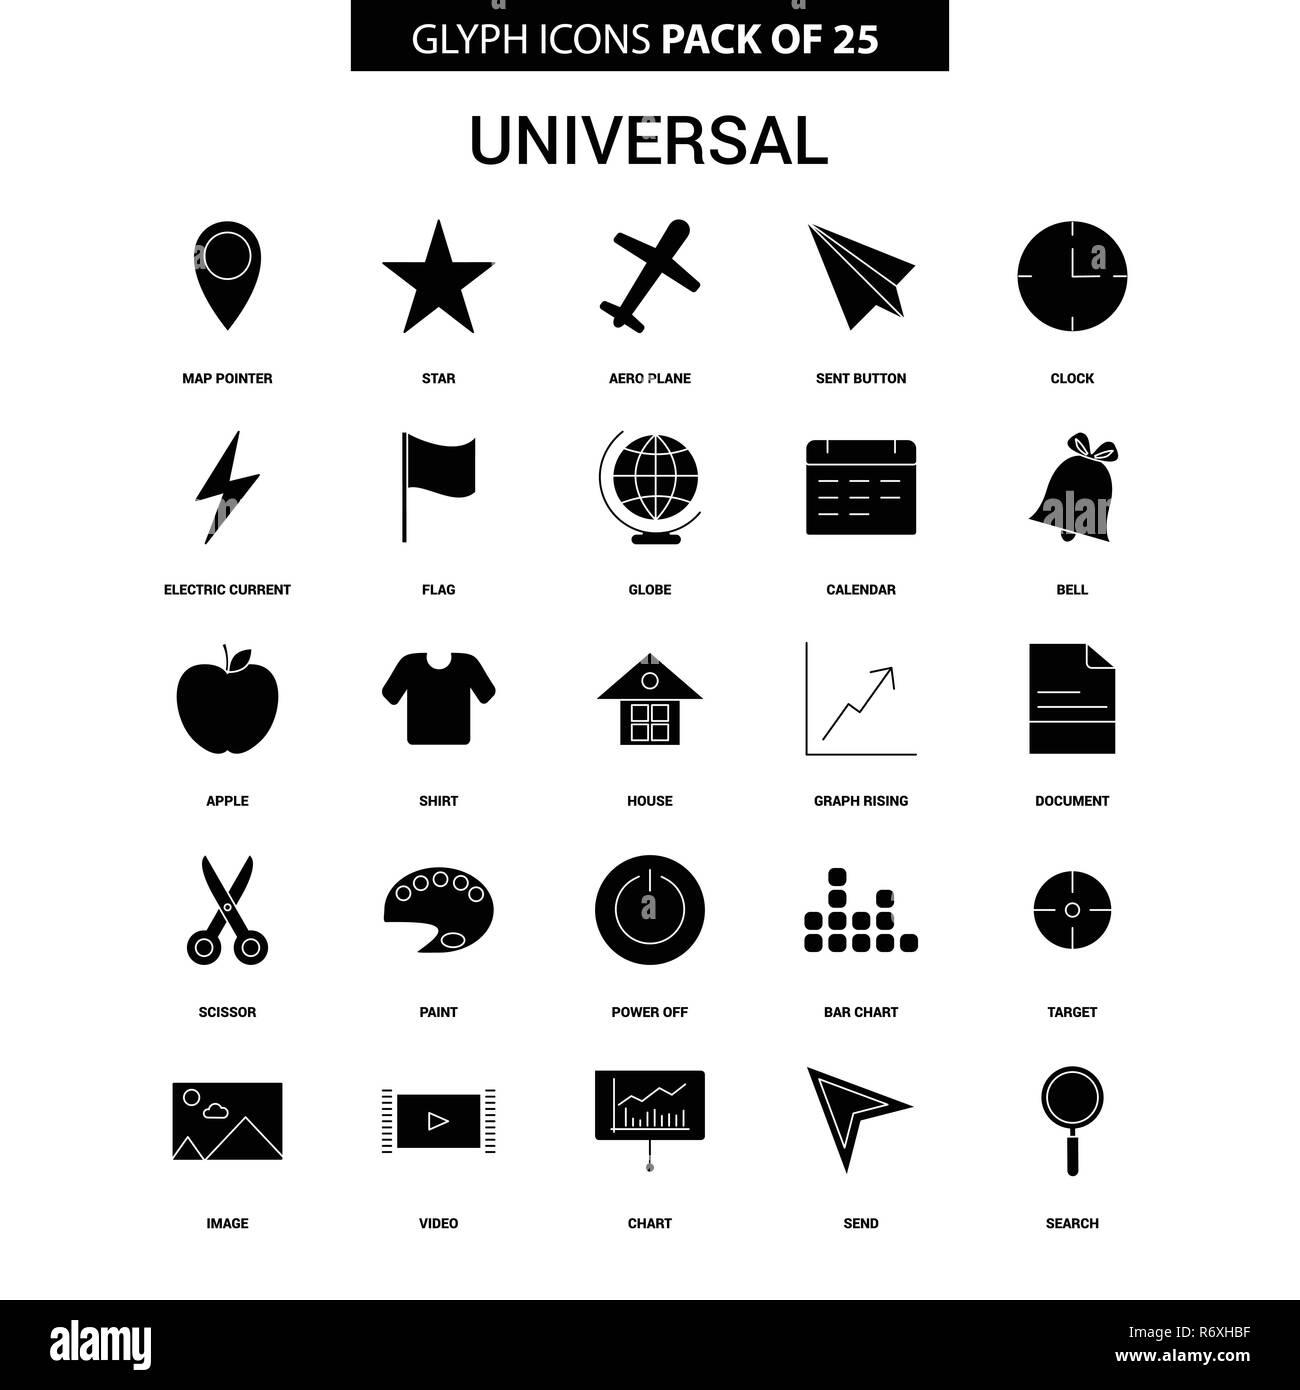 Universal Glyph Vector Icon set - Stock Image